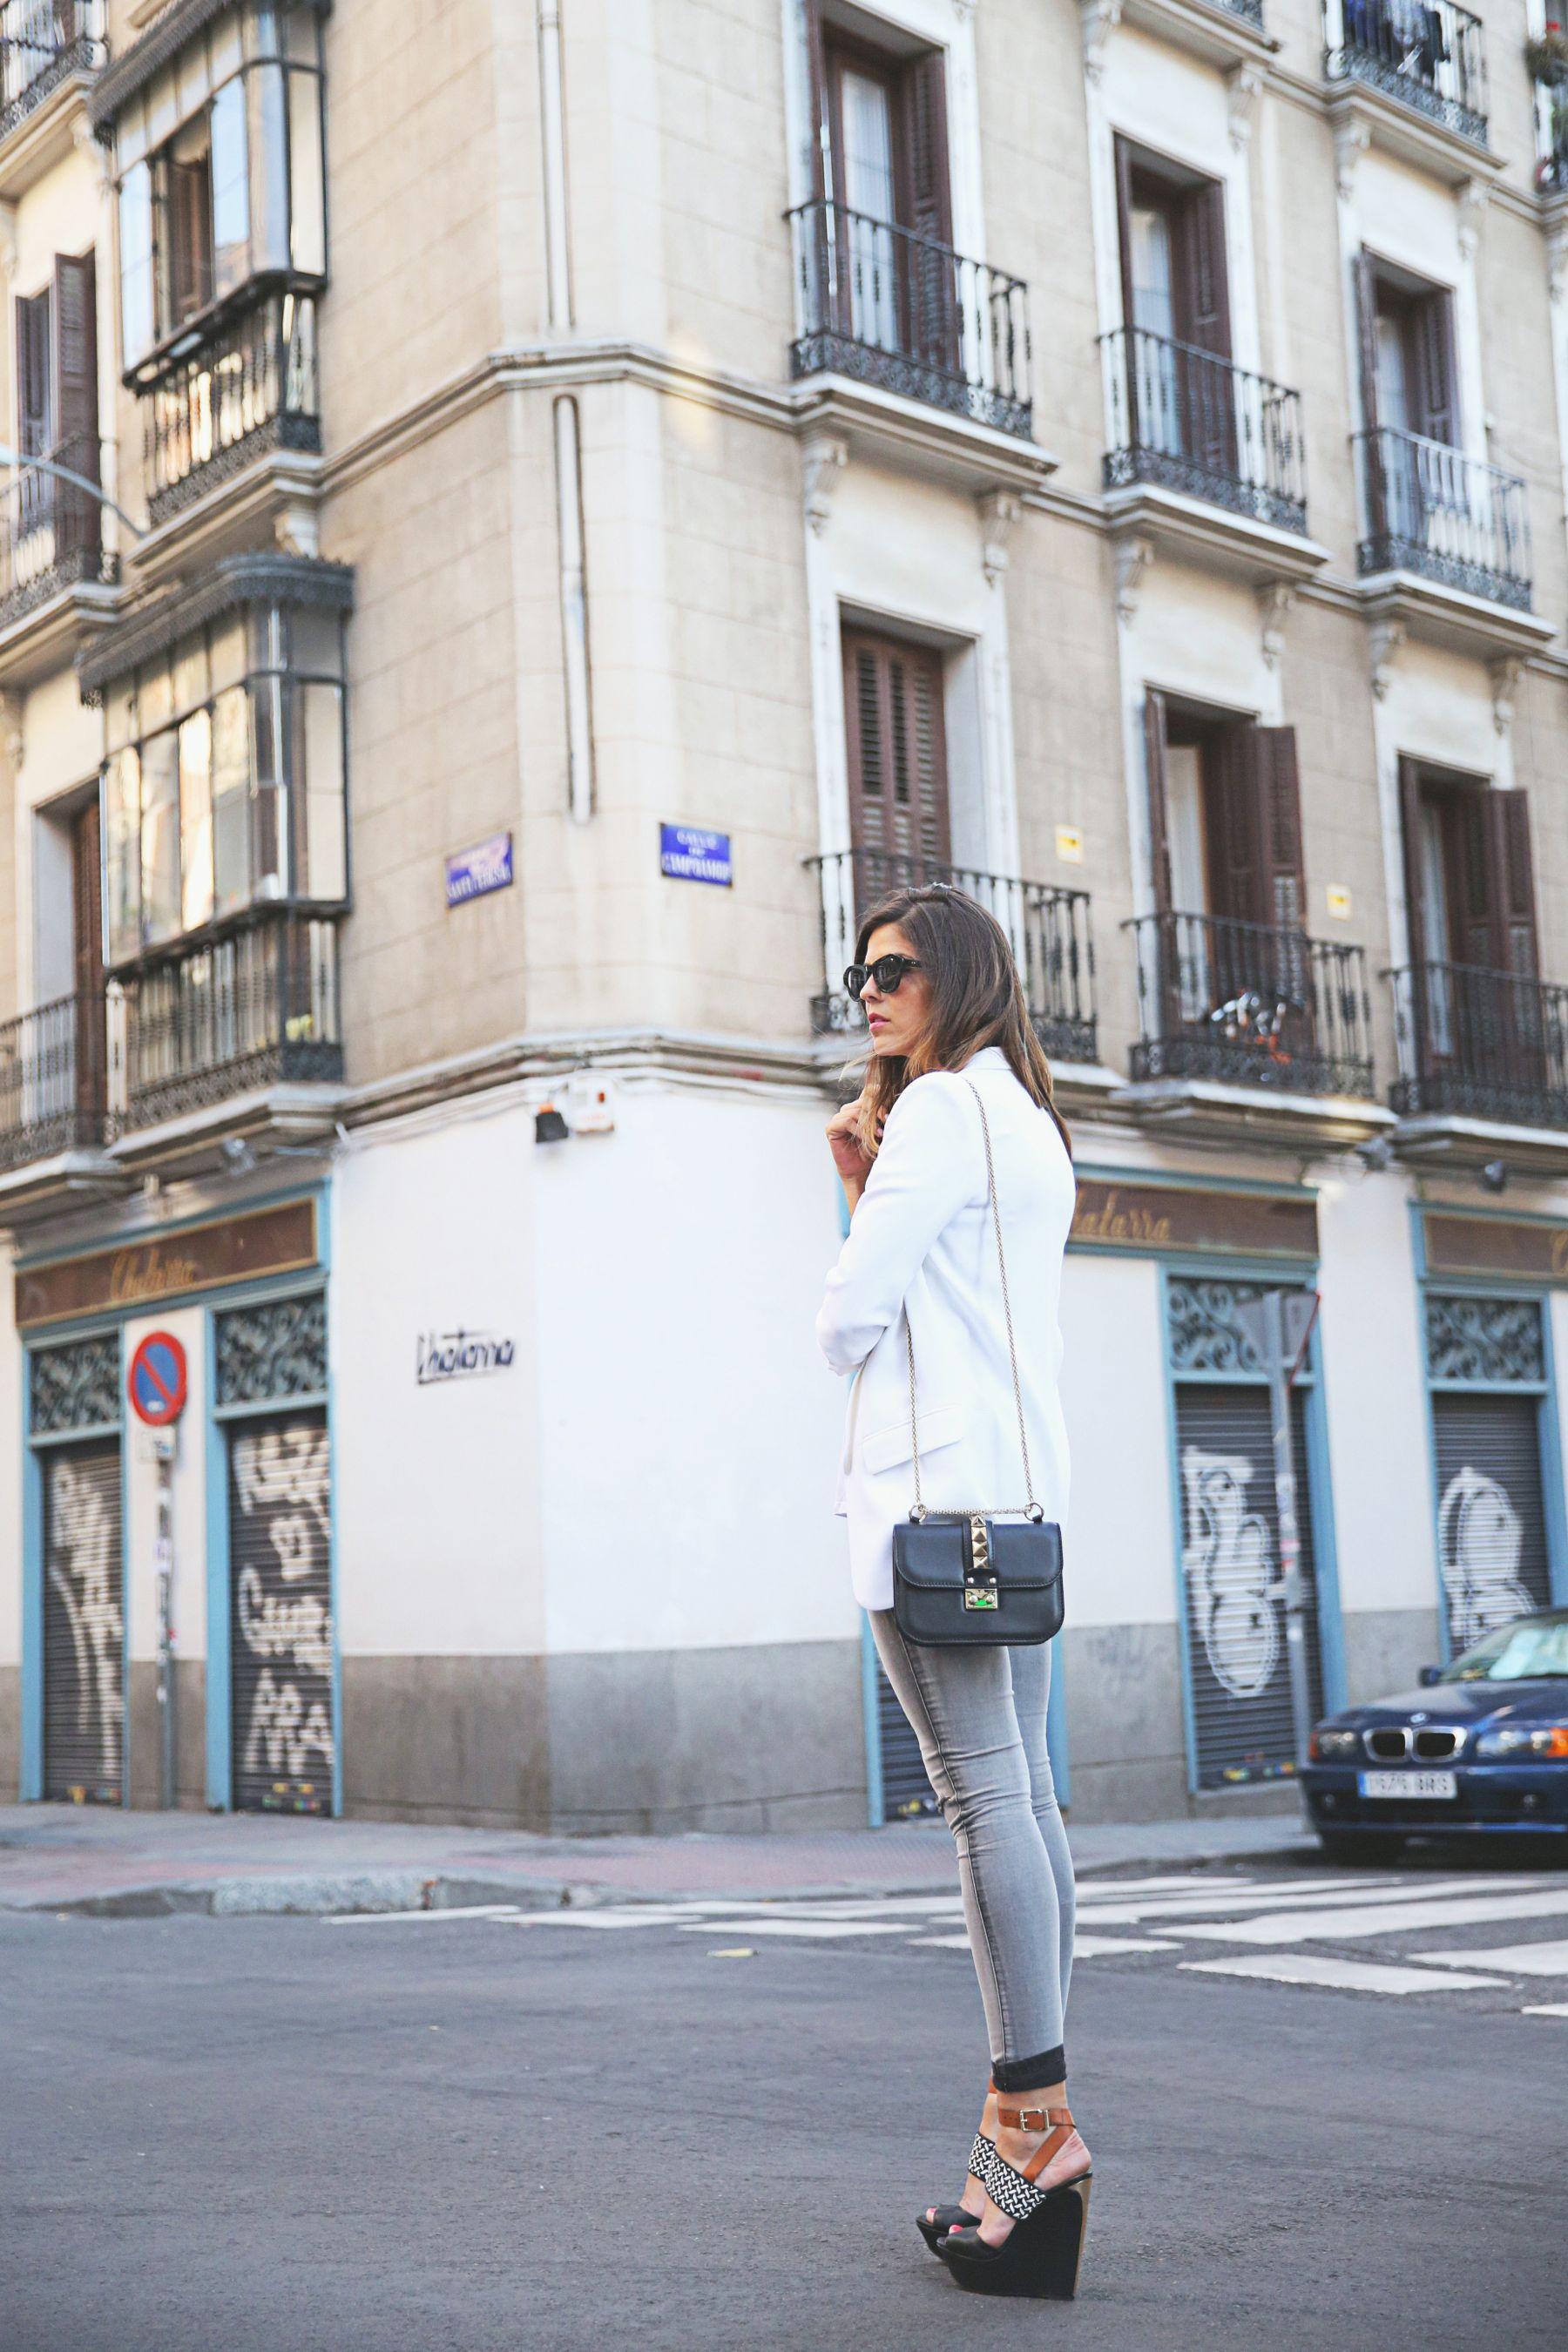 trendy-taste-look-outfit-street-style-ootd-blog-blogger-fashion-spain-moda-españa-SS15-verano2015-tendencias-trends-zara-buylevard-valentino-jessica-simpson-skinny-jeans-grey-white-blazer-americana-blanca-vaqueros-pitillo-sandalias-sandals-etnicas-5